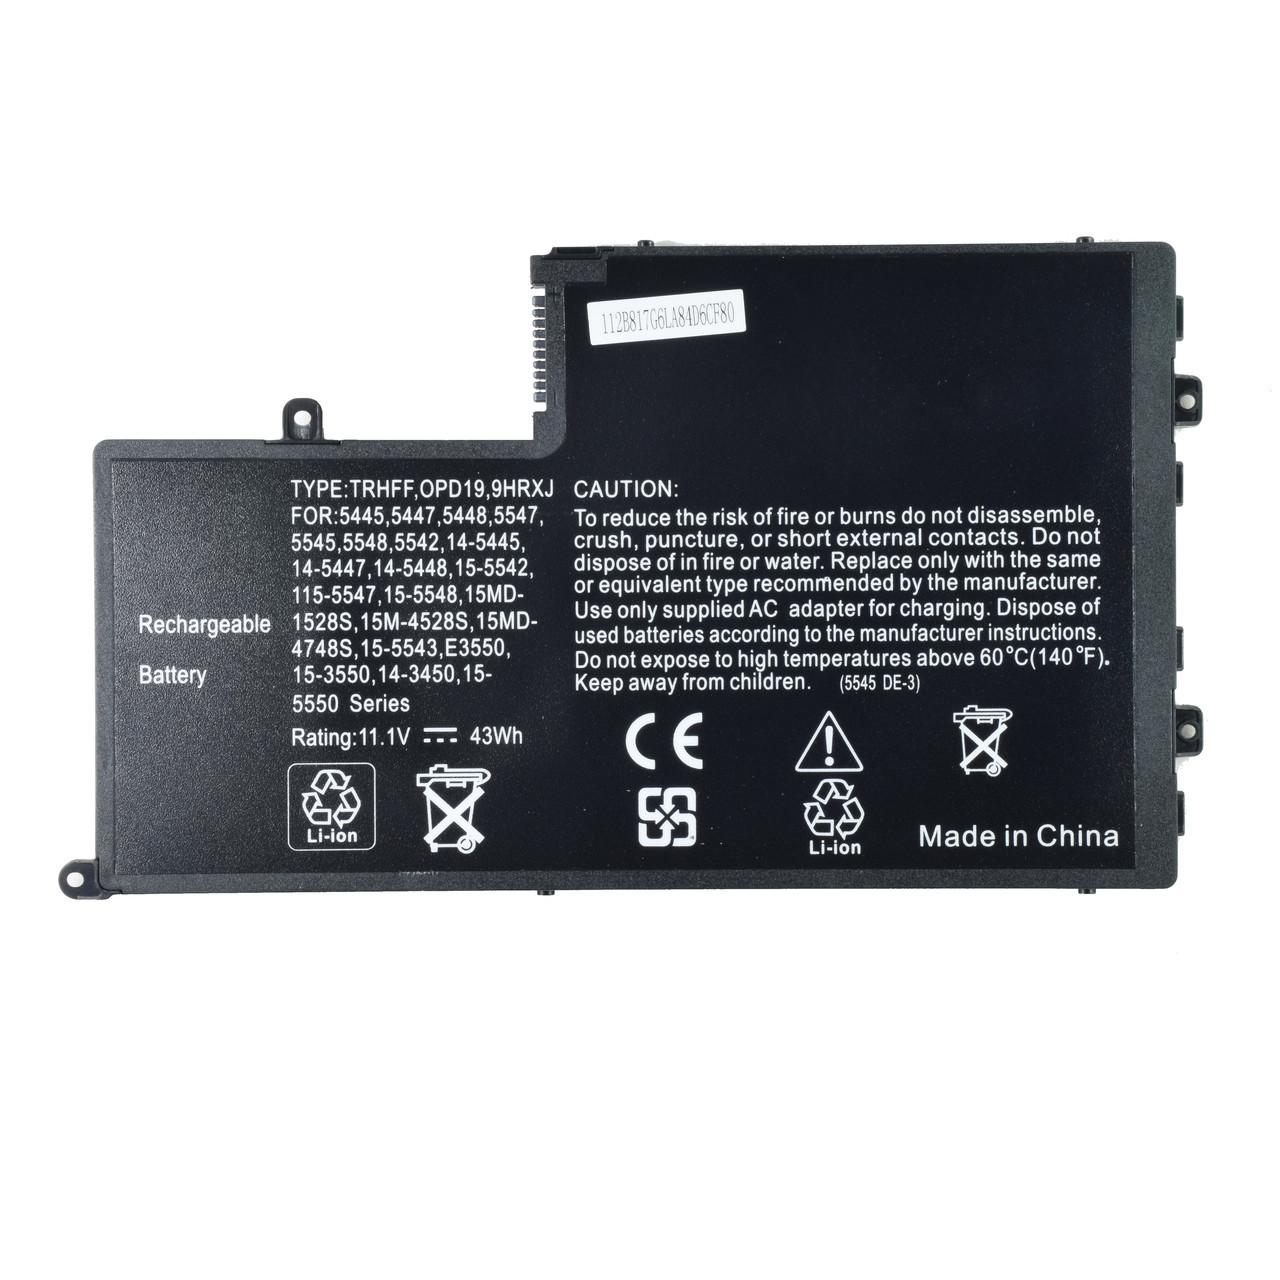 Батарея для ноутбука DELL DL011307-PRR13G01 DFVYN P39F Inspiron 5445 5447 5448 5547 5545 5548